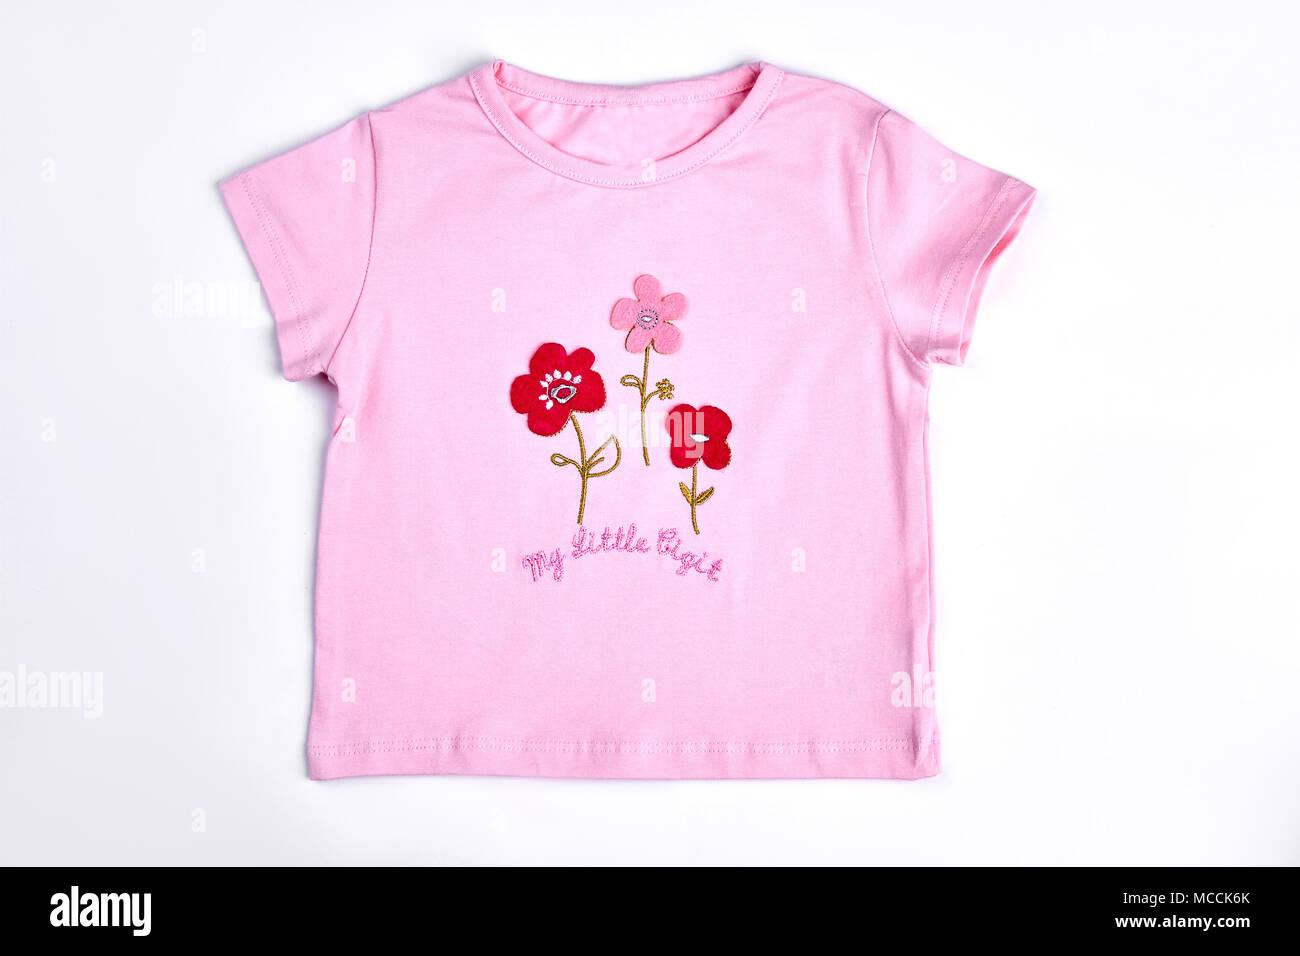 6db07768bc68 Baby-girl pink cartoon t-shirt. Hermoso algodón camiseta de manga corta para